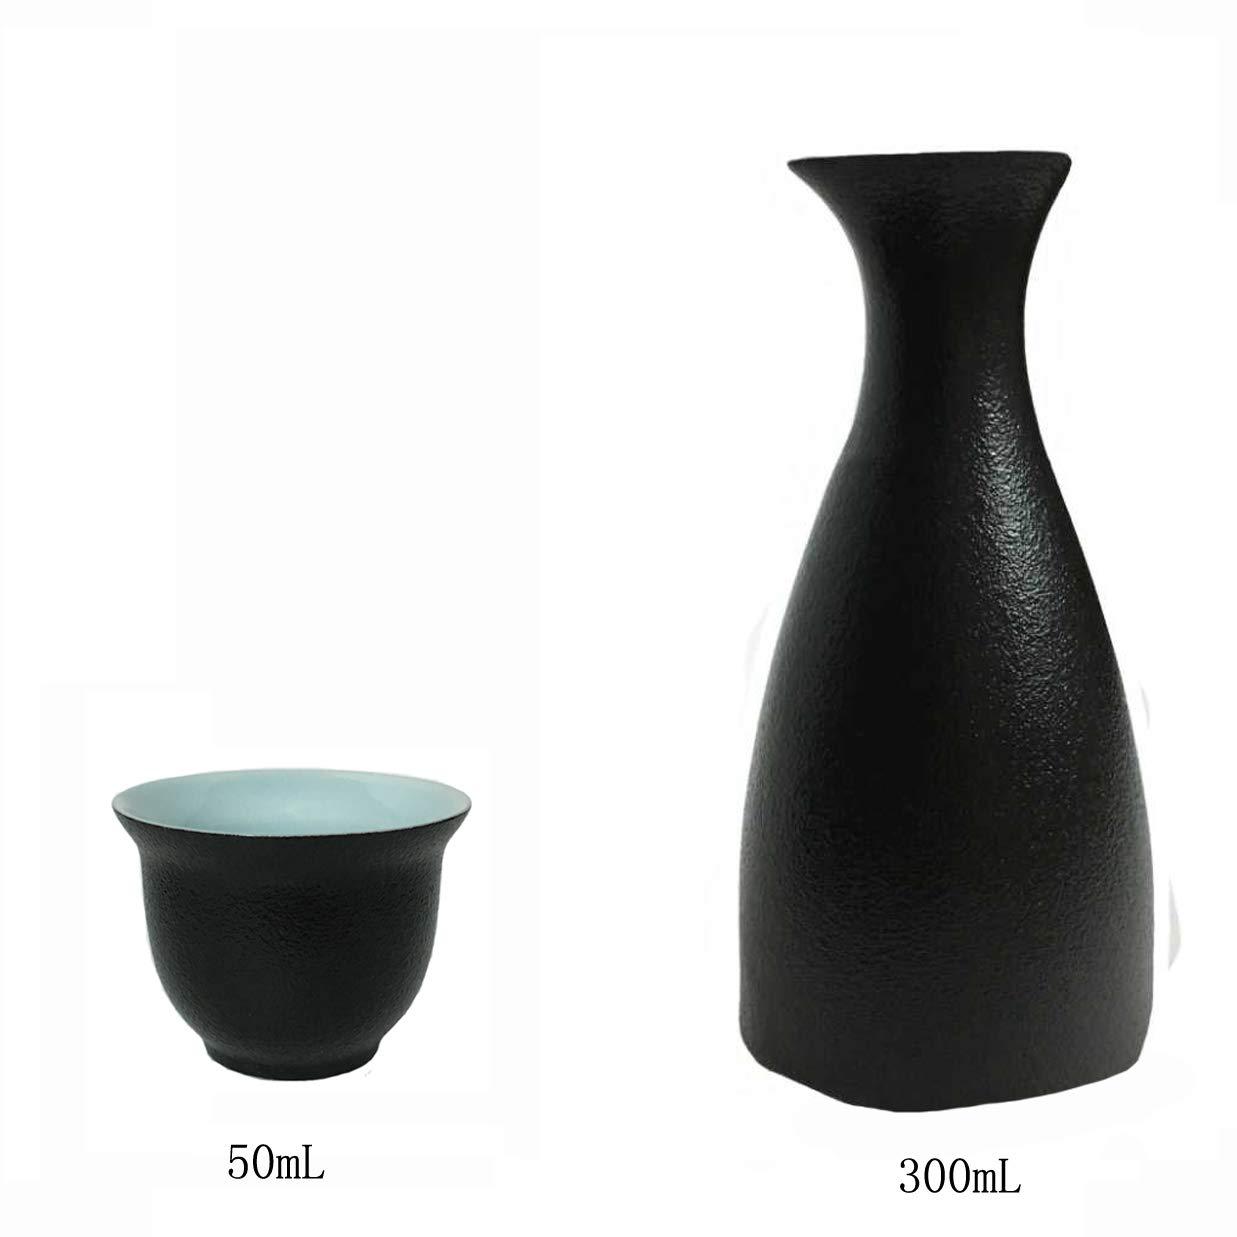 KCHAIN Ceramic Sake Set Handcraft Traditional Black Pottery with 1PC Sake Carafe and 6PCS Sake Cups Black/&Sky Blue